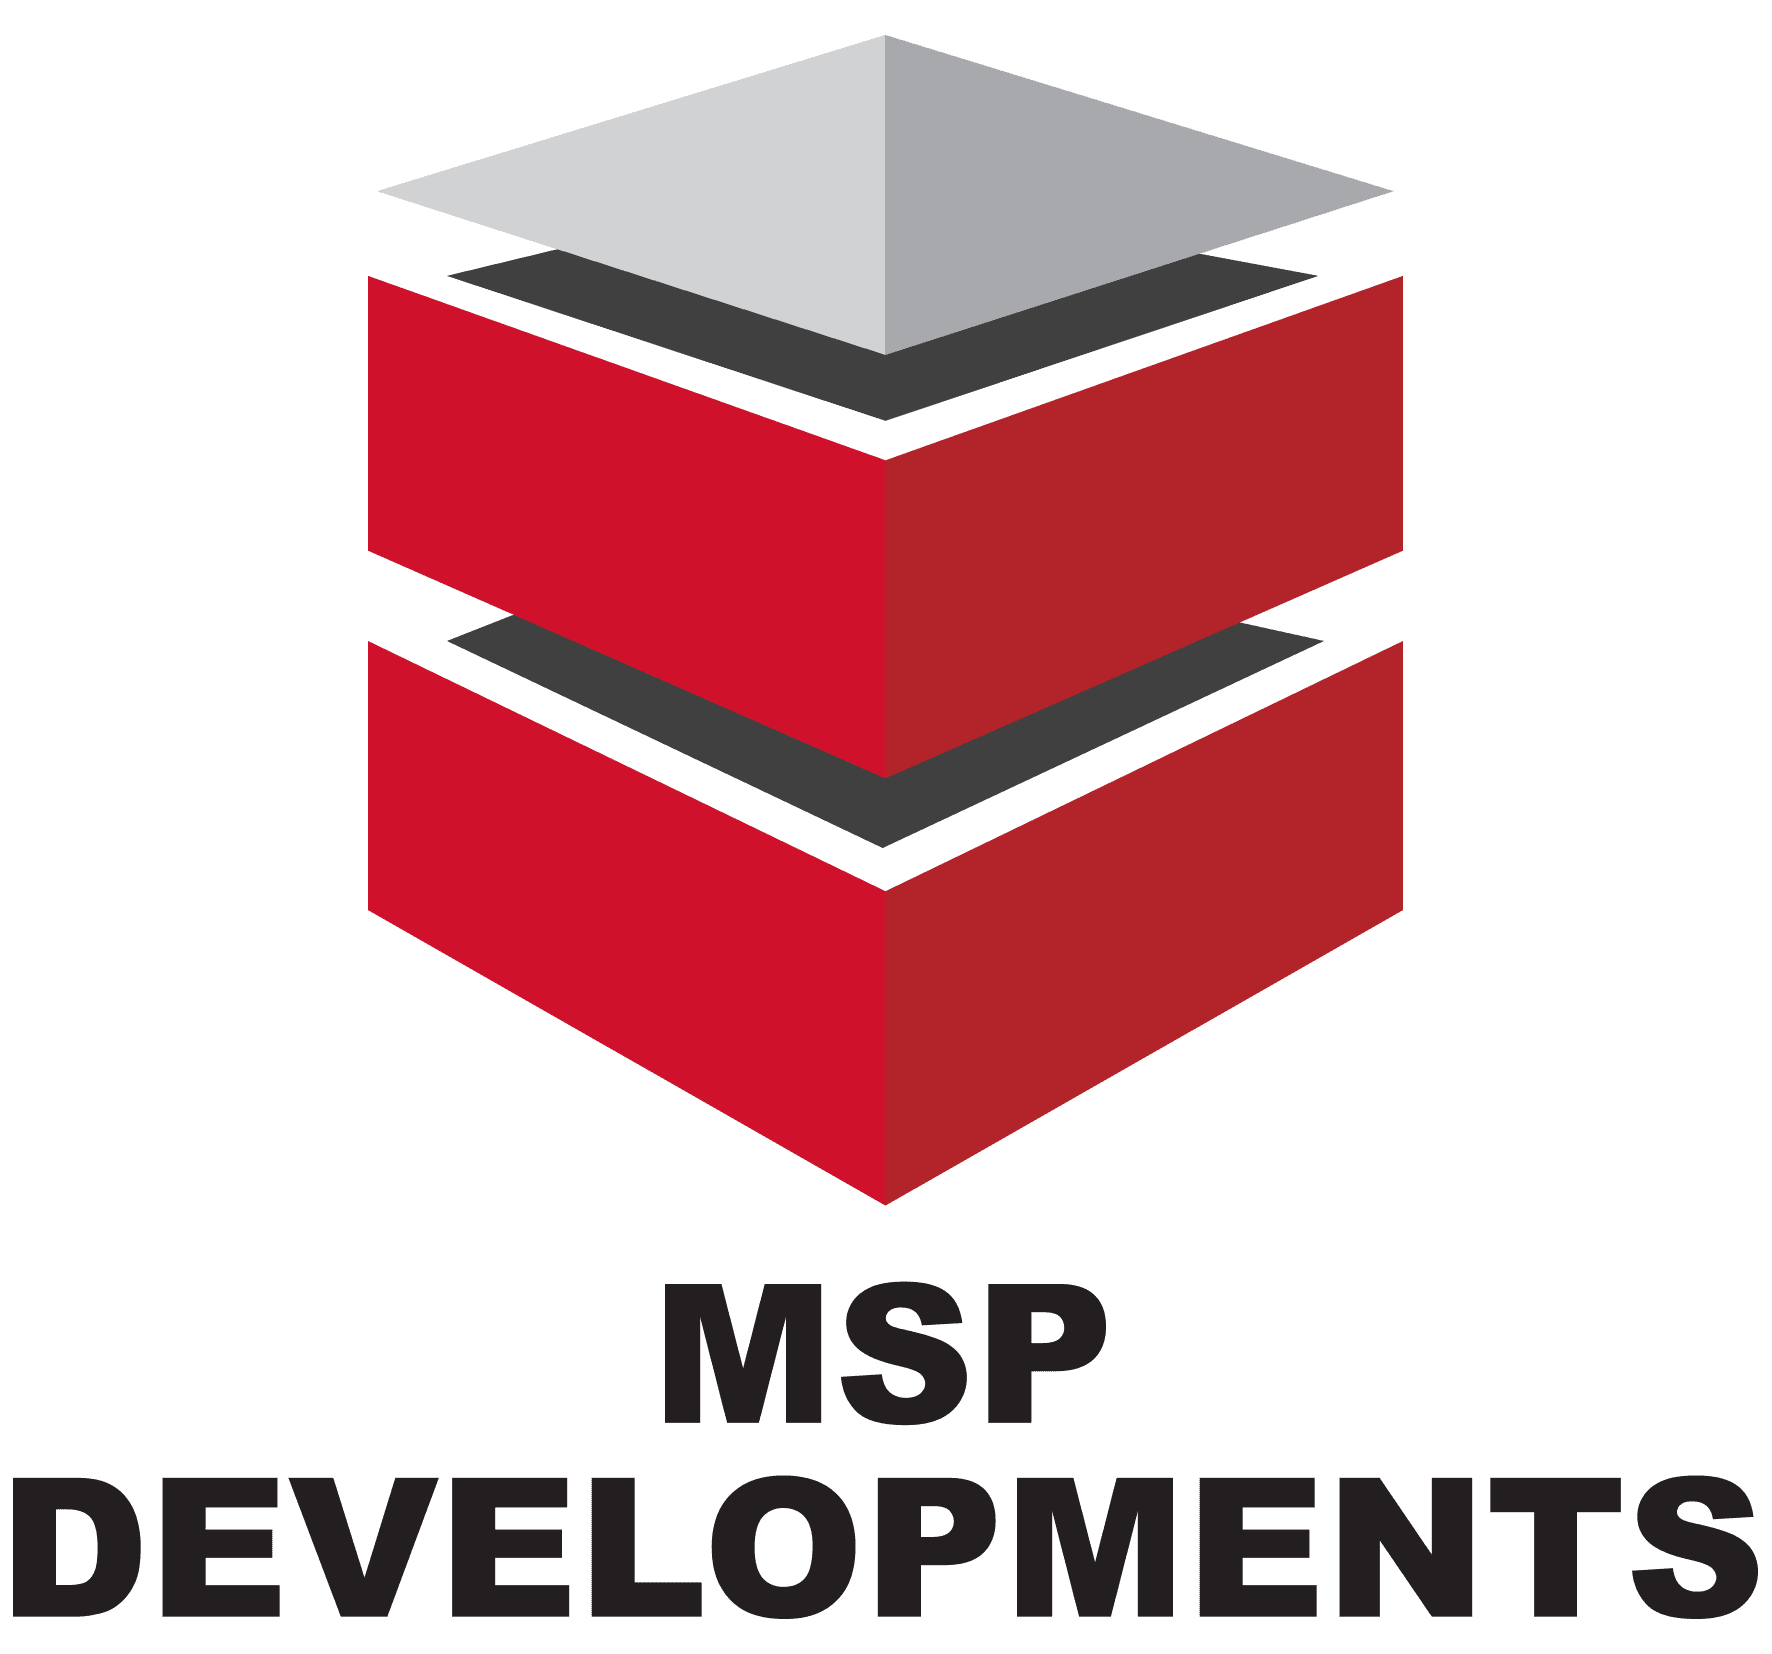 MSP Developments